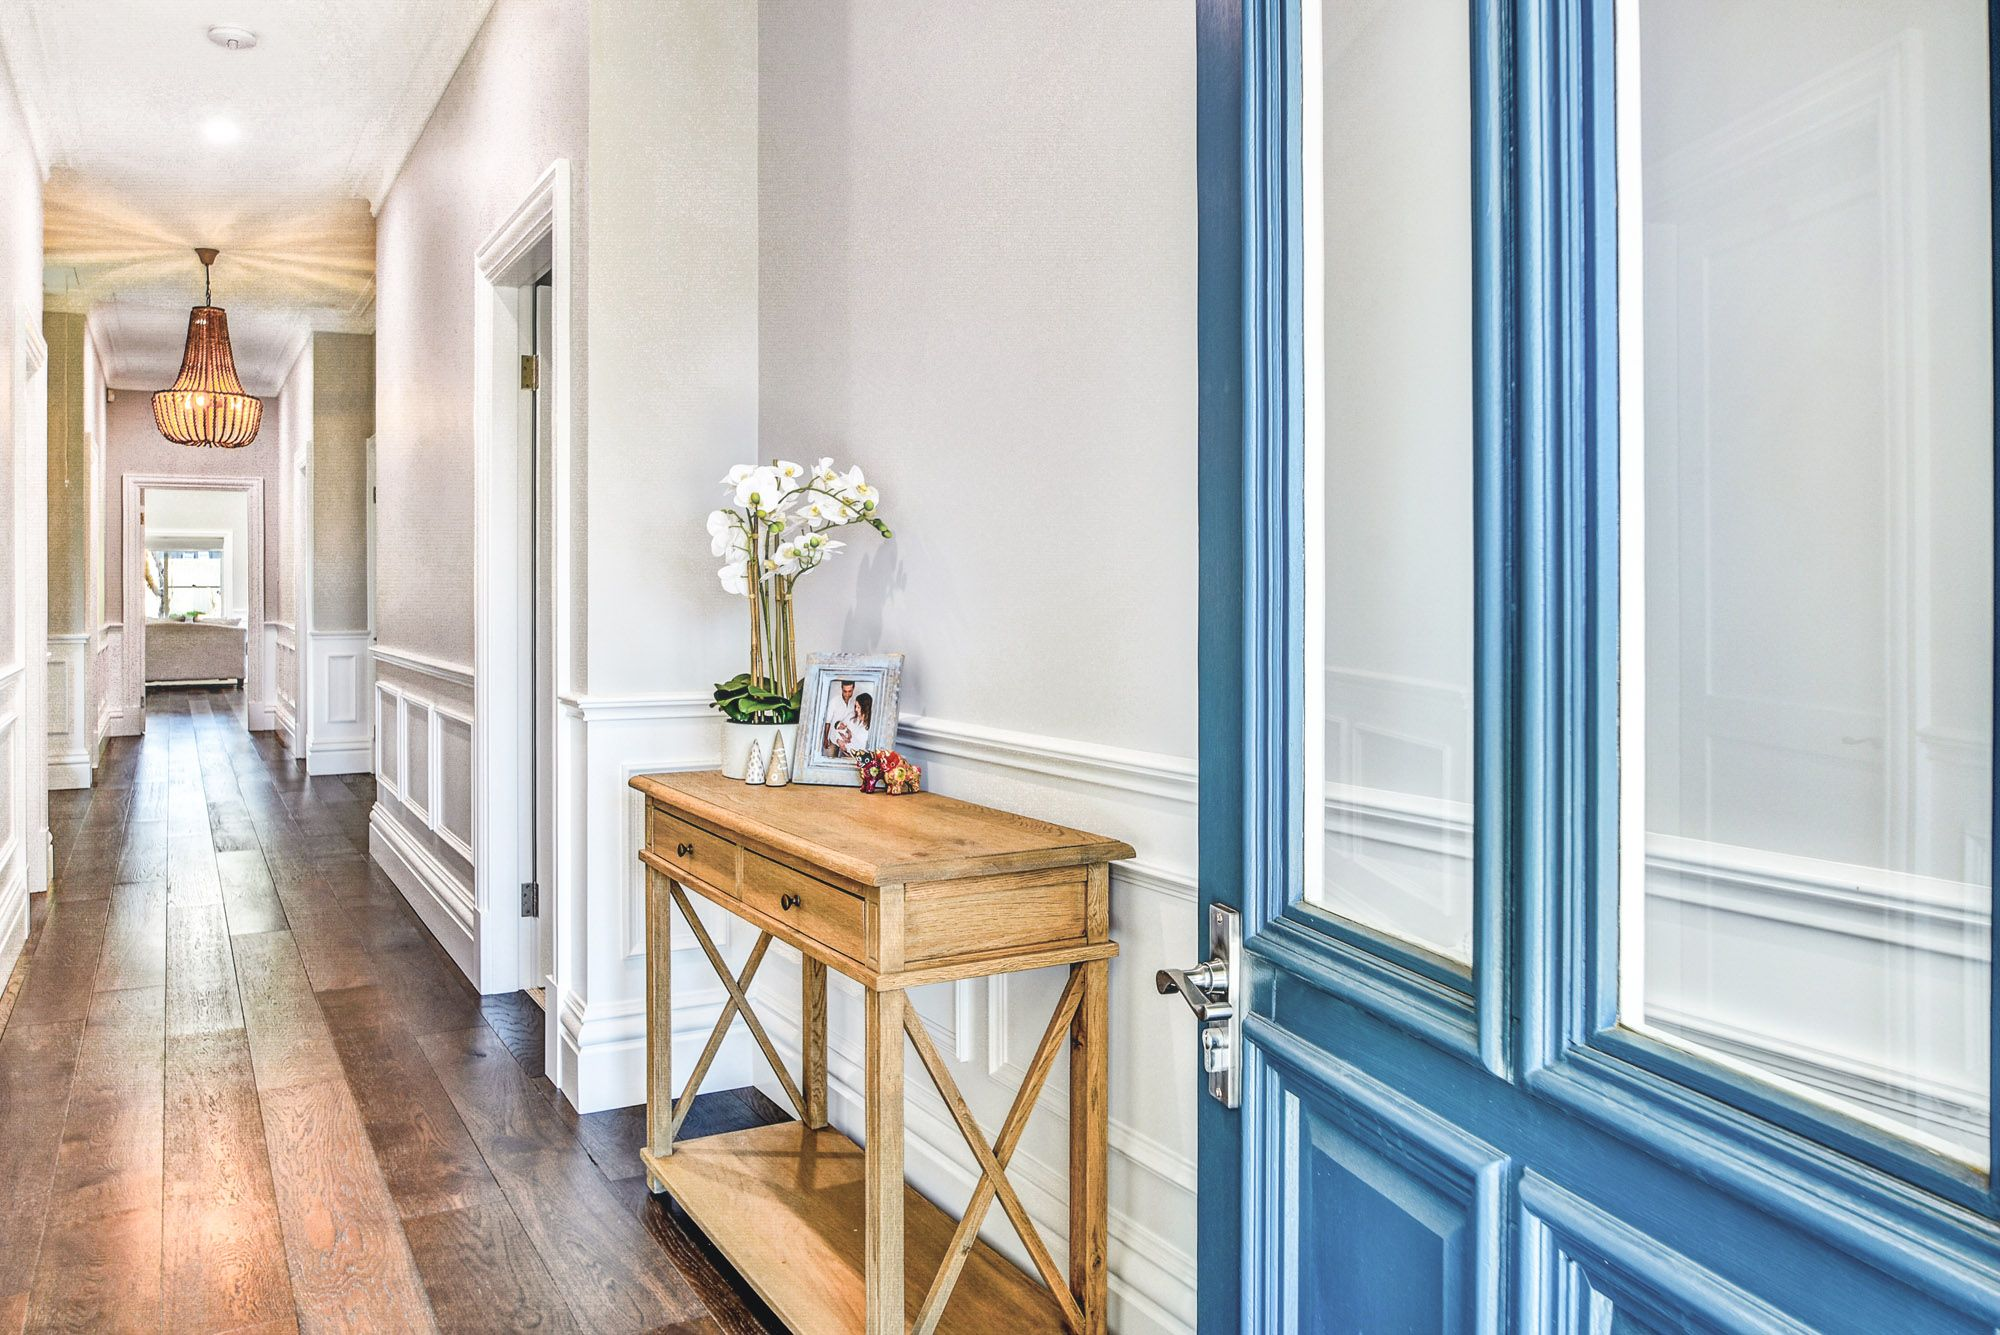 Hamptons Interior Designs Styles Homes In 2020 Hamptons Style